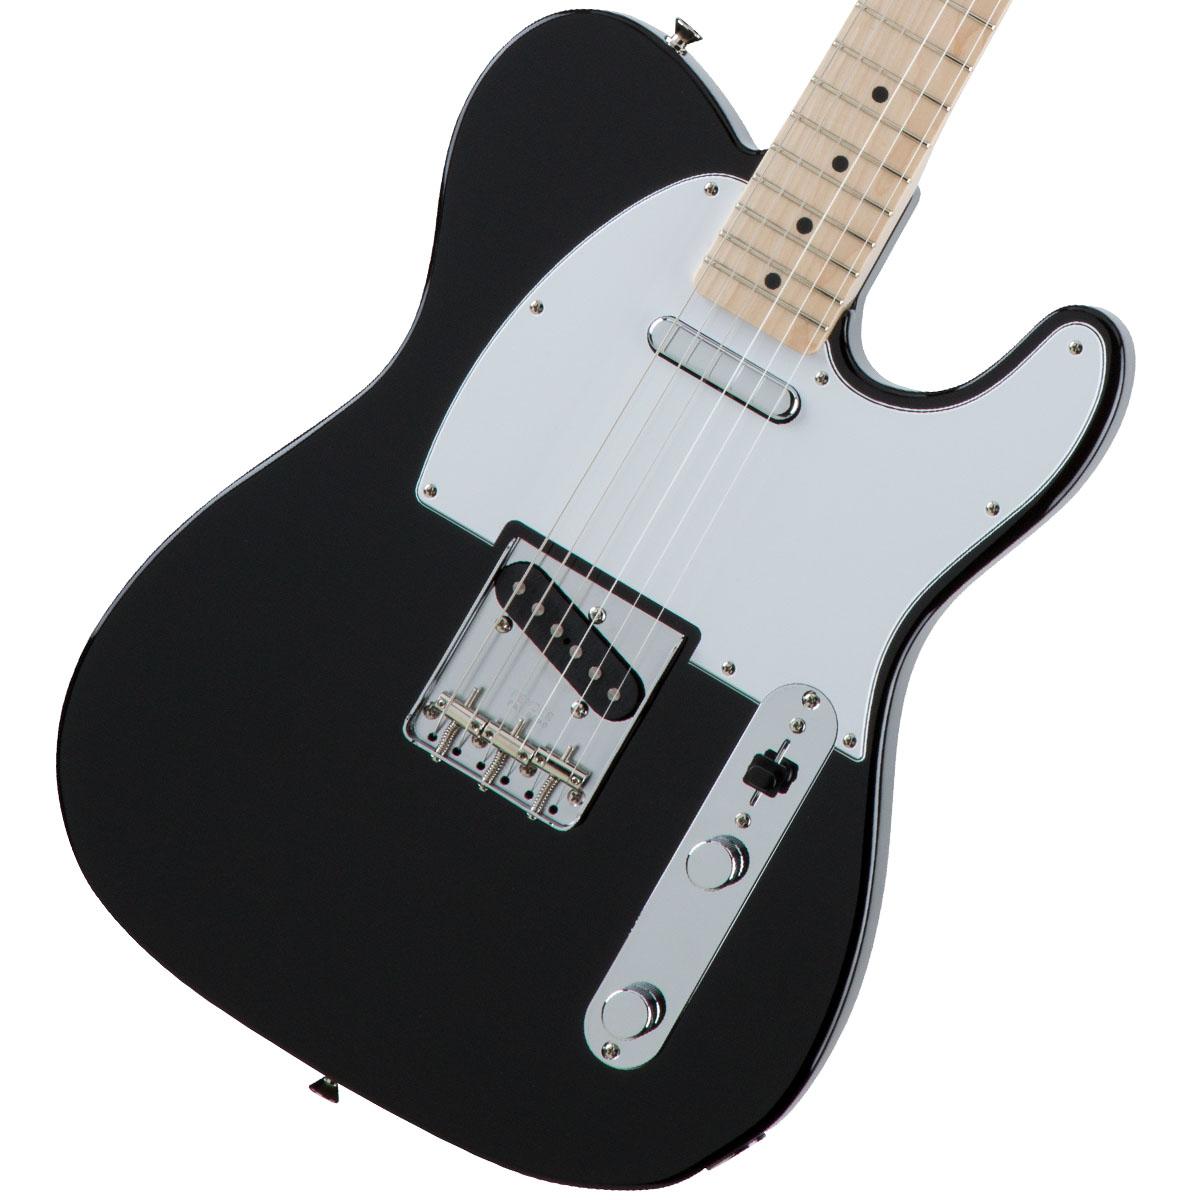 Fender /【即納可能】Made in Japan Traditional 70s Telecaster Ash Maple Fingerboard Black【御茶ノ水本店】